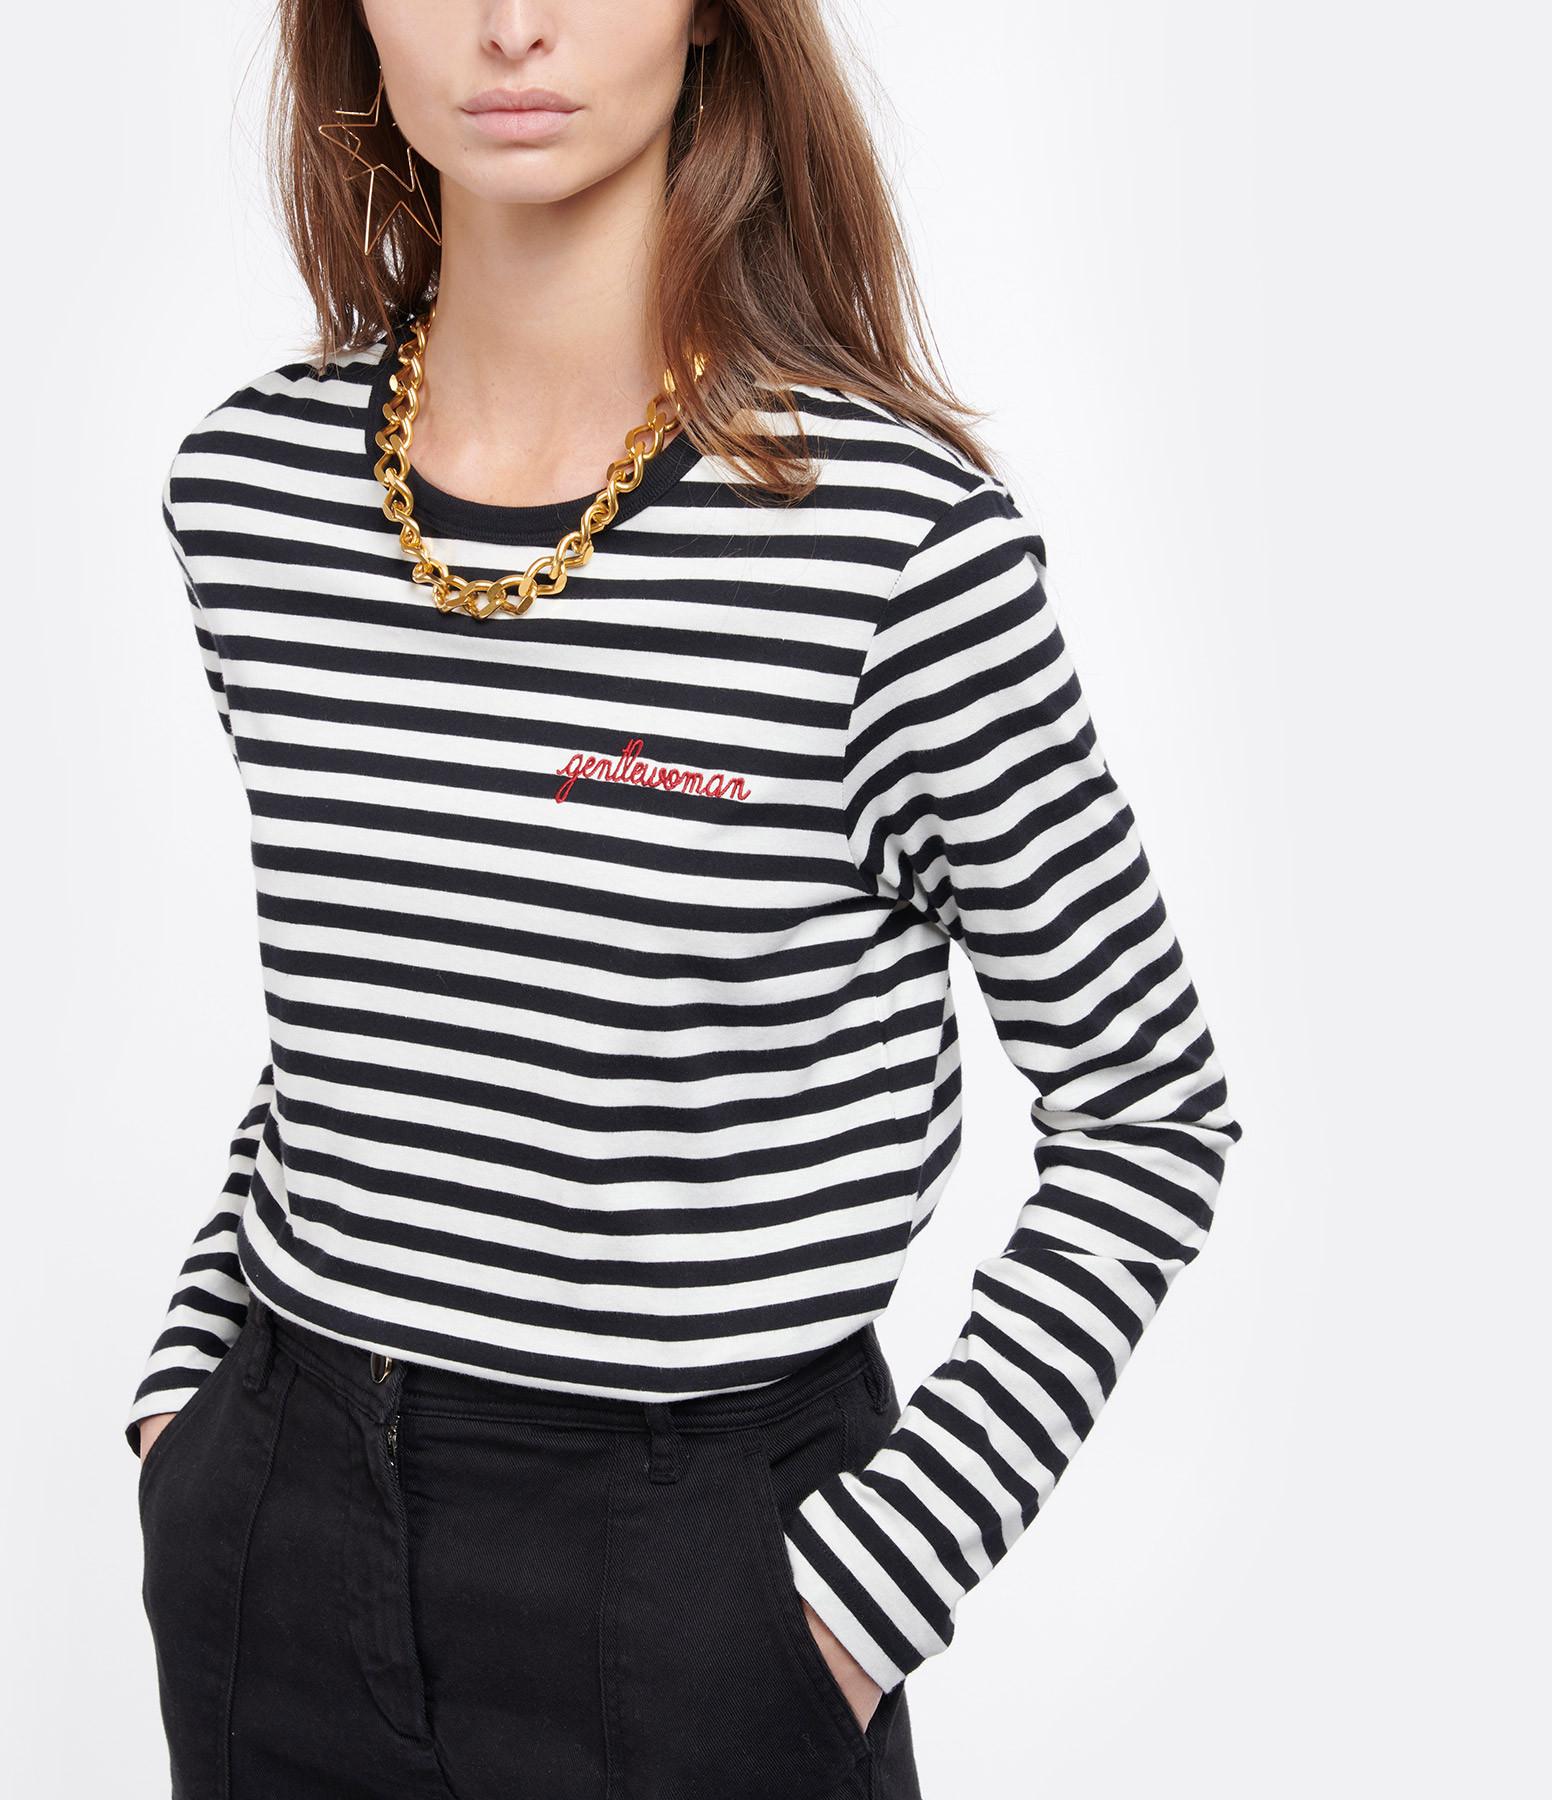 MAISON LABICHE - Tee-shirt Gentlewoman Rayures Noir Blanc